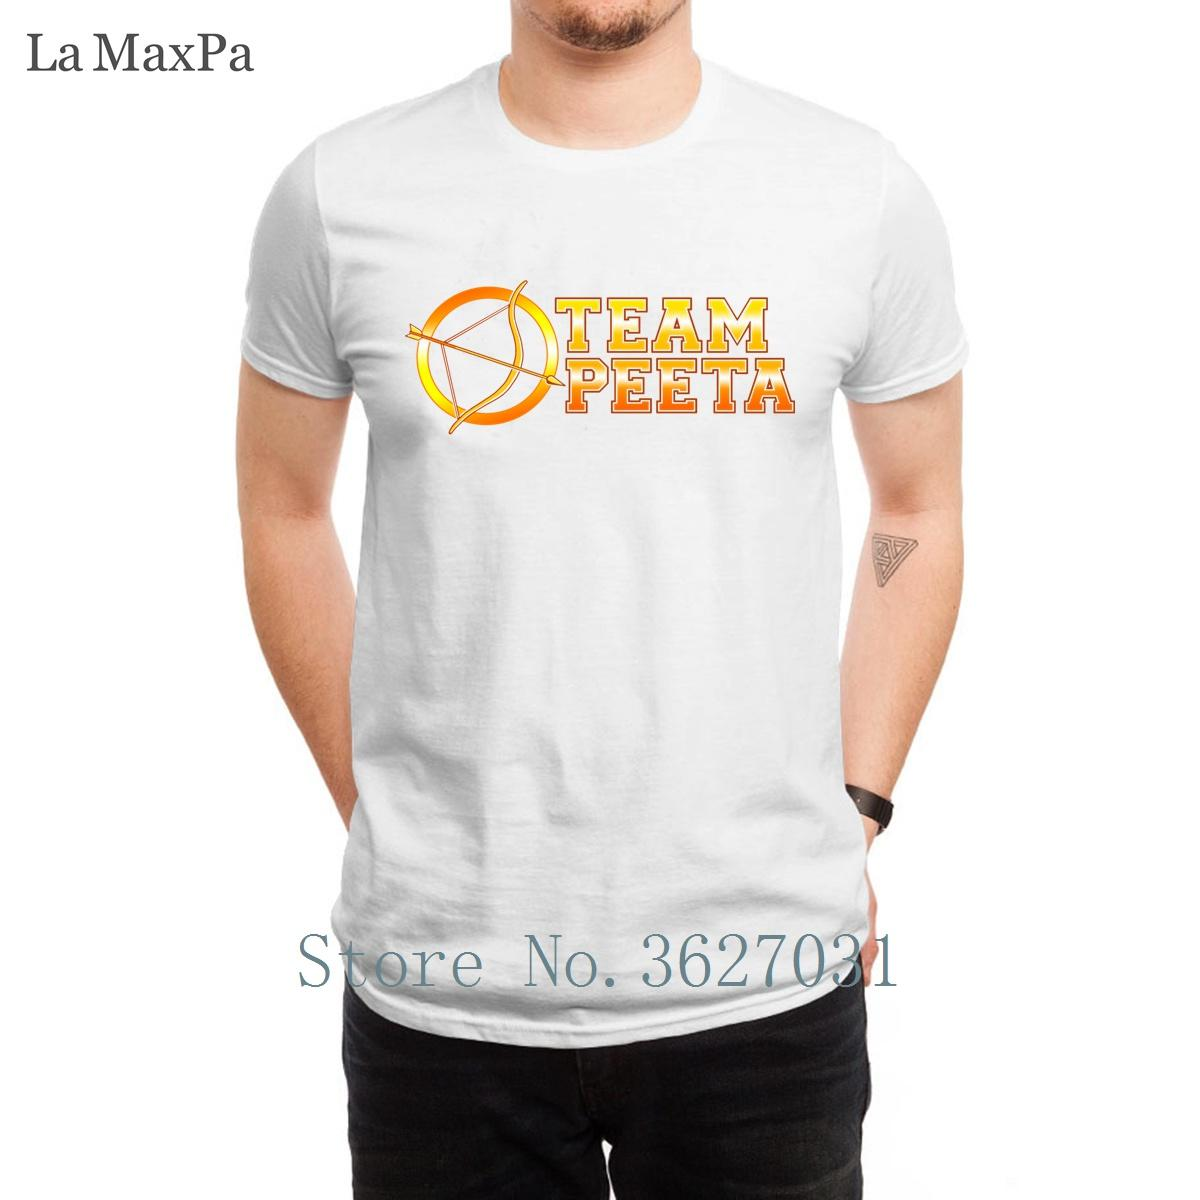 Designer Original T Shirt For Mens Team Peeta T-Shirts Weird Costume For Mens Comical 100% Cotton Mens Tee Shirt Tee Top